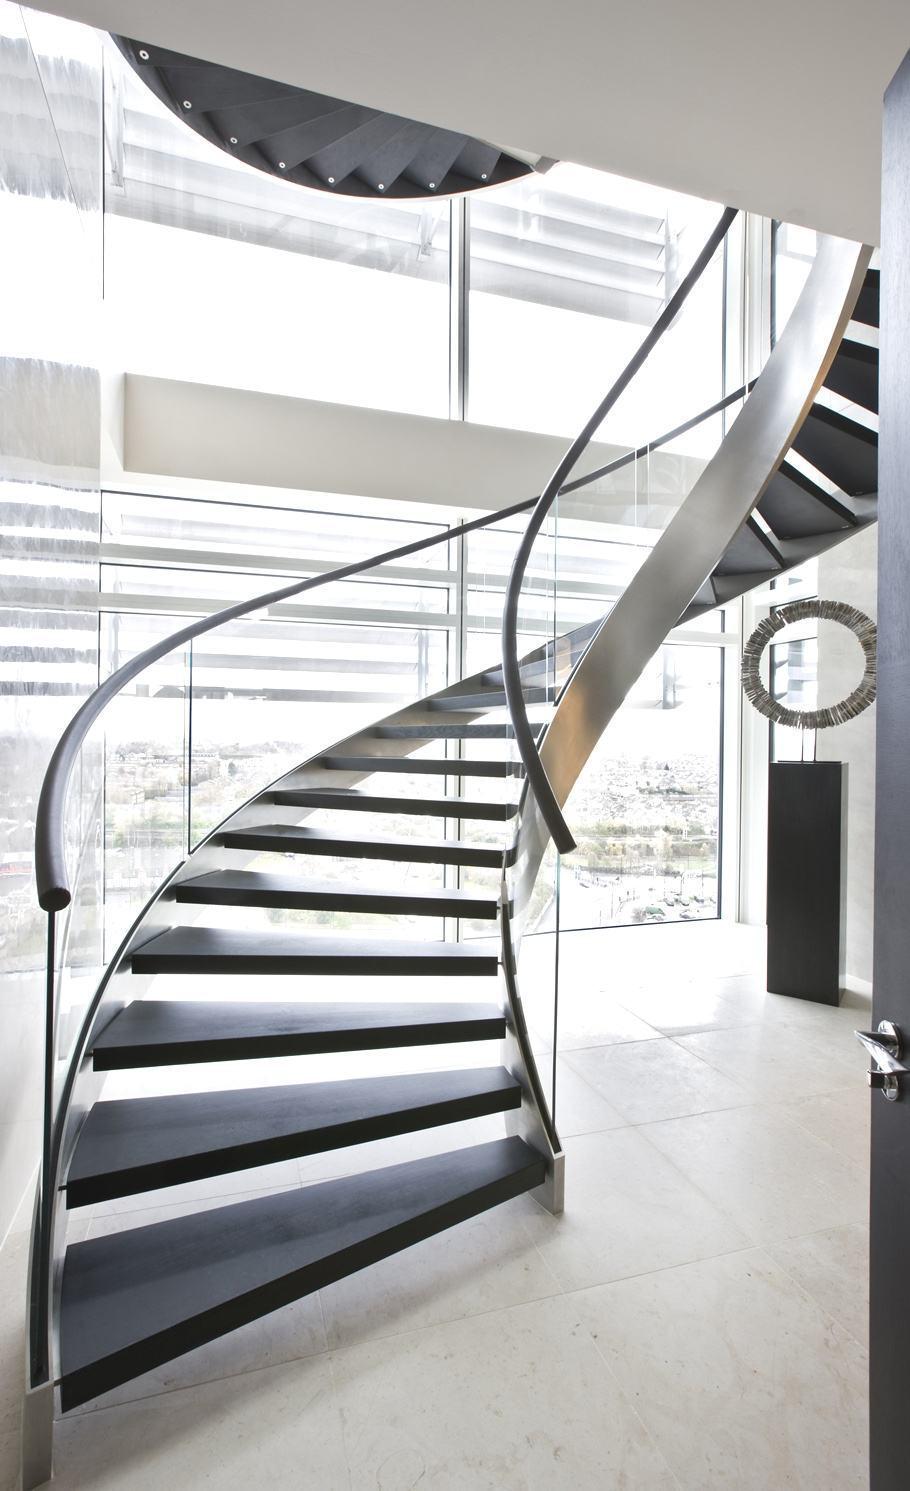 Resultado de imagem para Escada circular